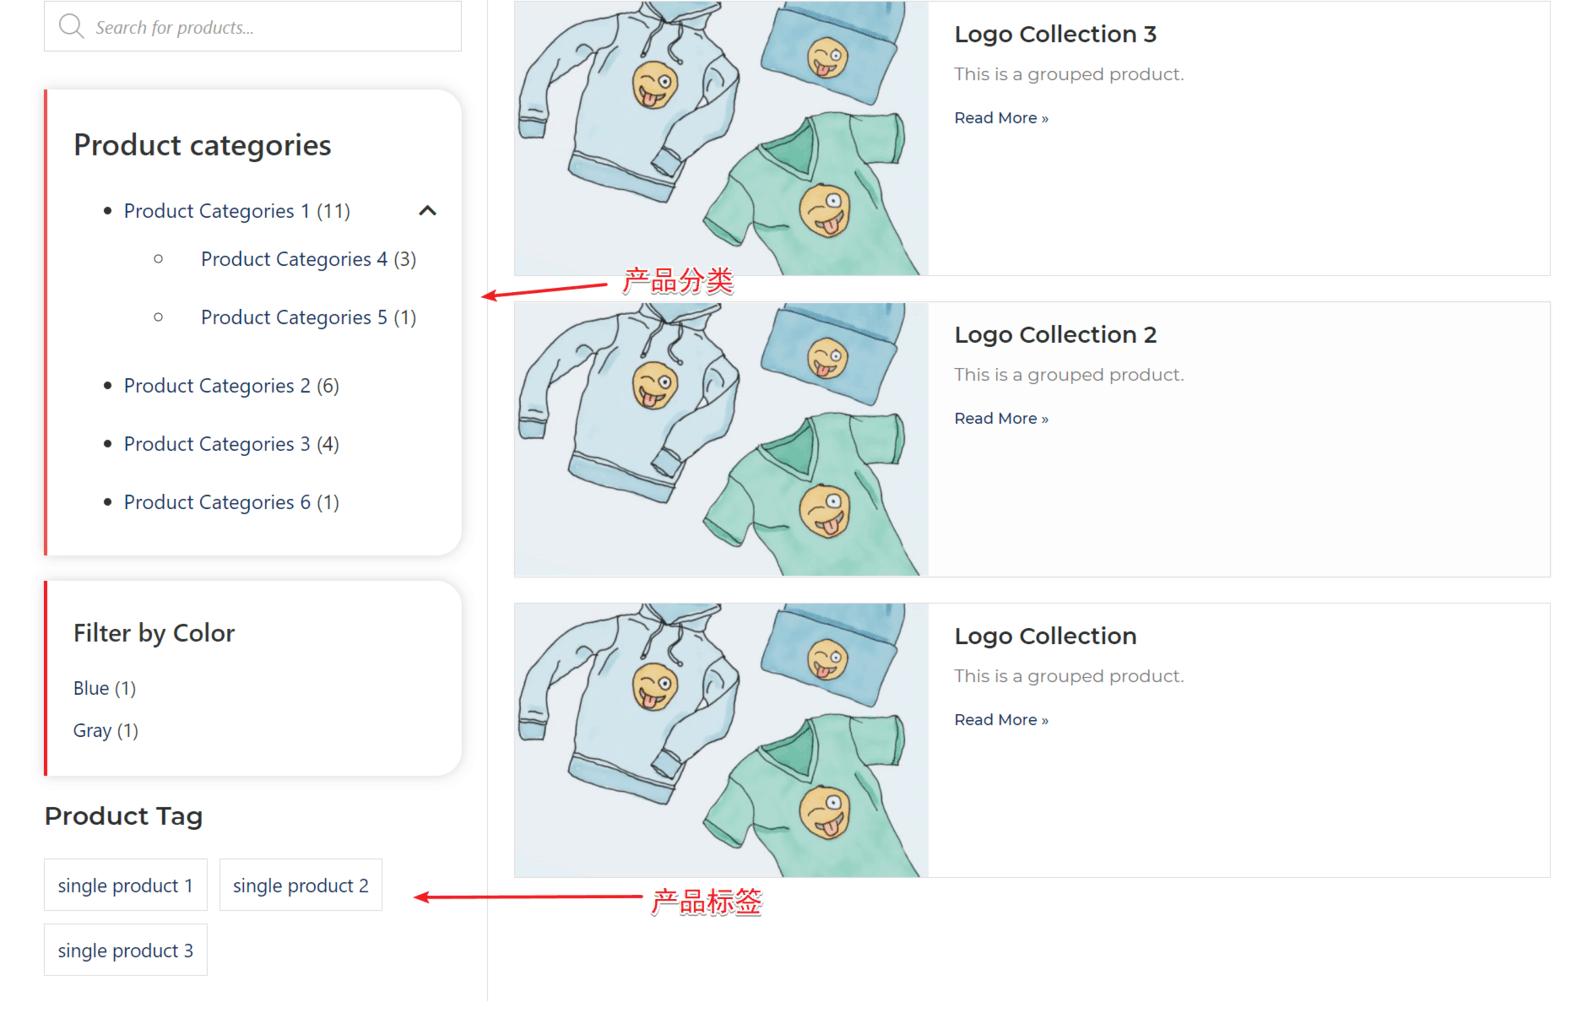 image 1 - 如何用Elementor Pro设计WooCommerce产品分类和产品标签侧边栏的样式